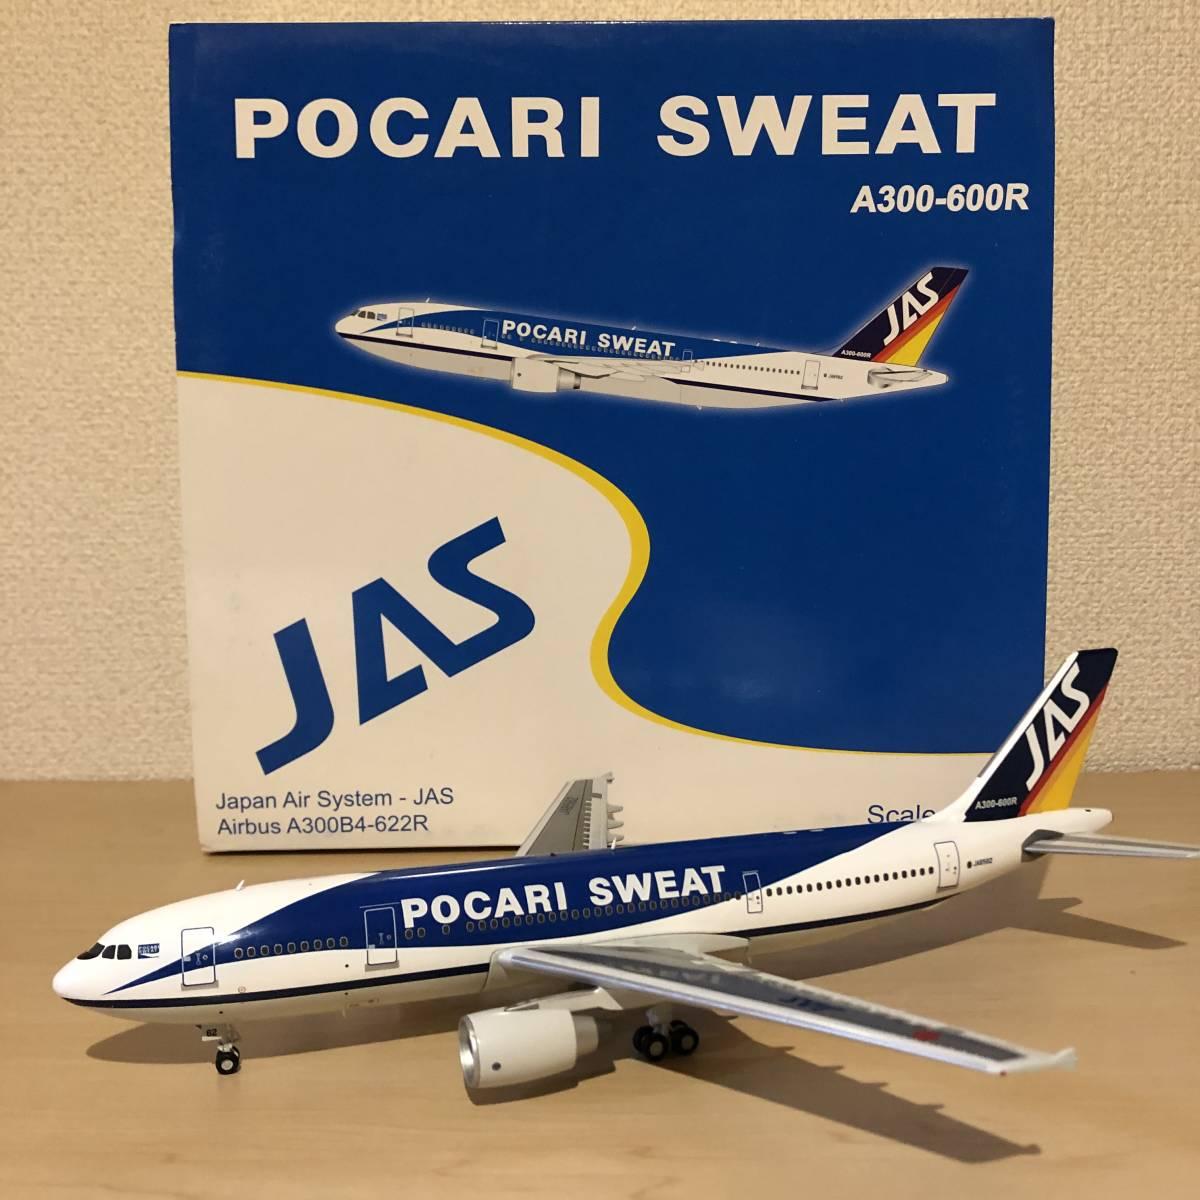 1/200 jc wings JAS A300 -600 JAL ポカリスウェット塗装 JA8562  最安値 最終機